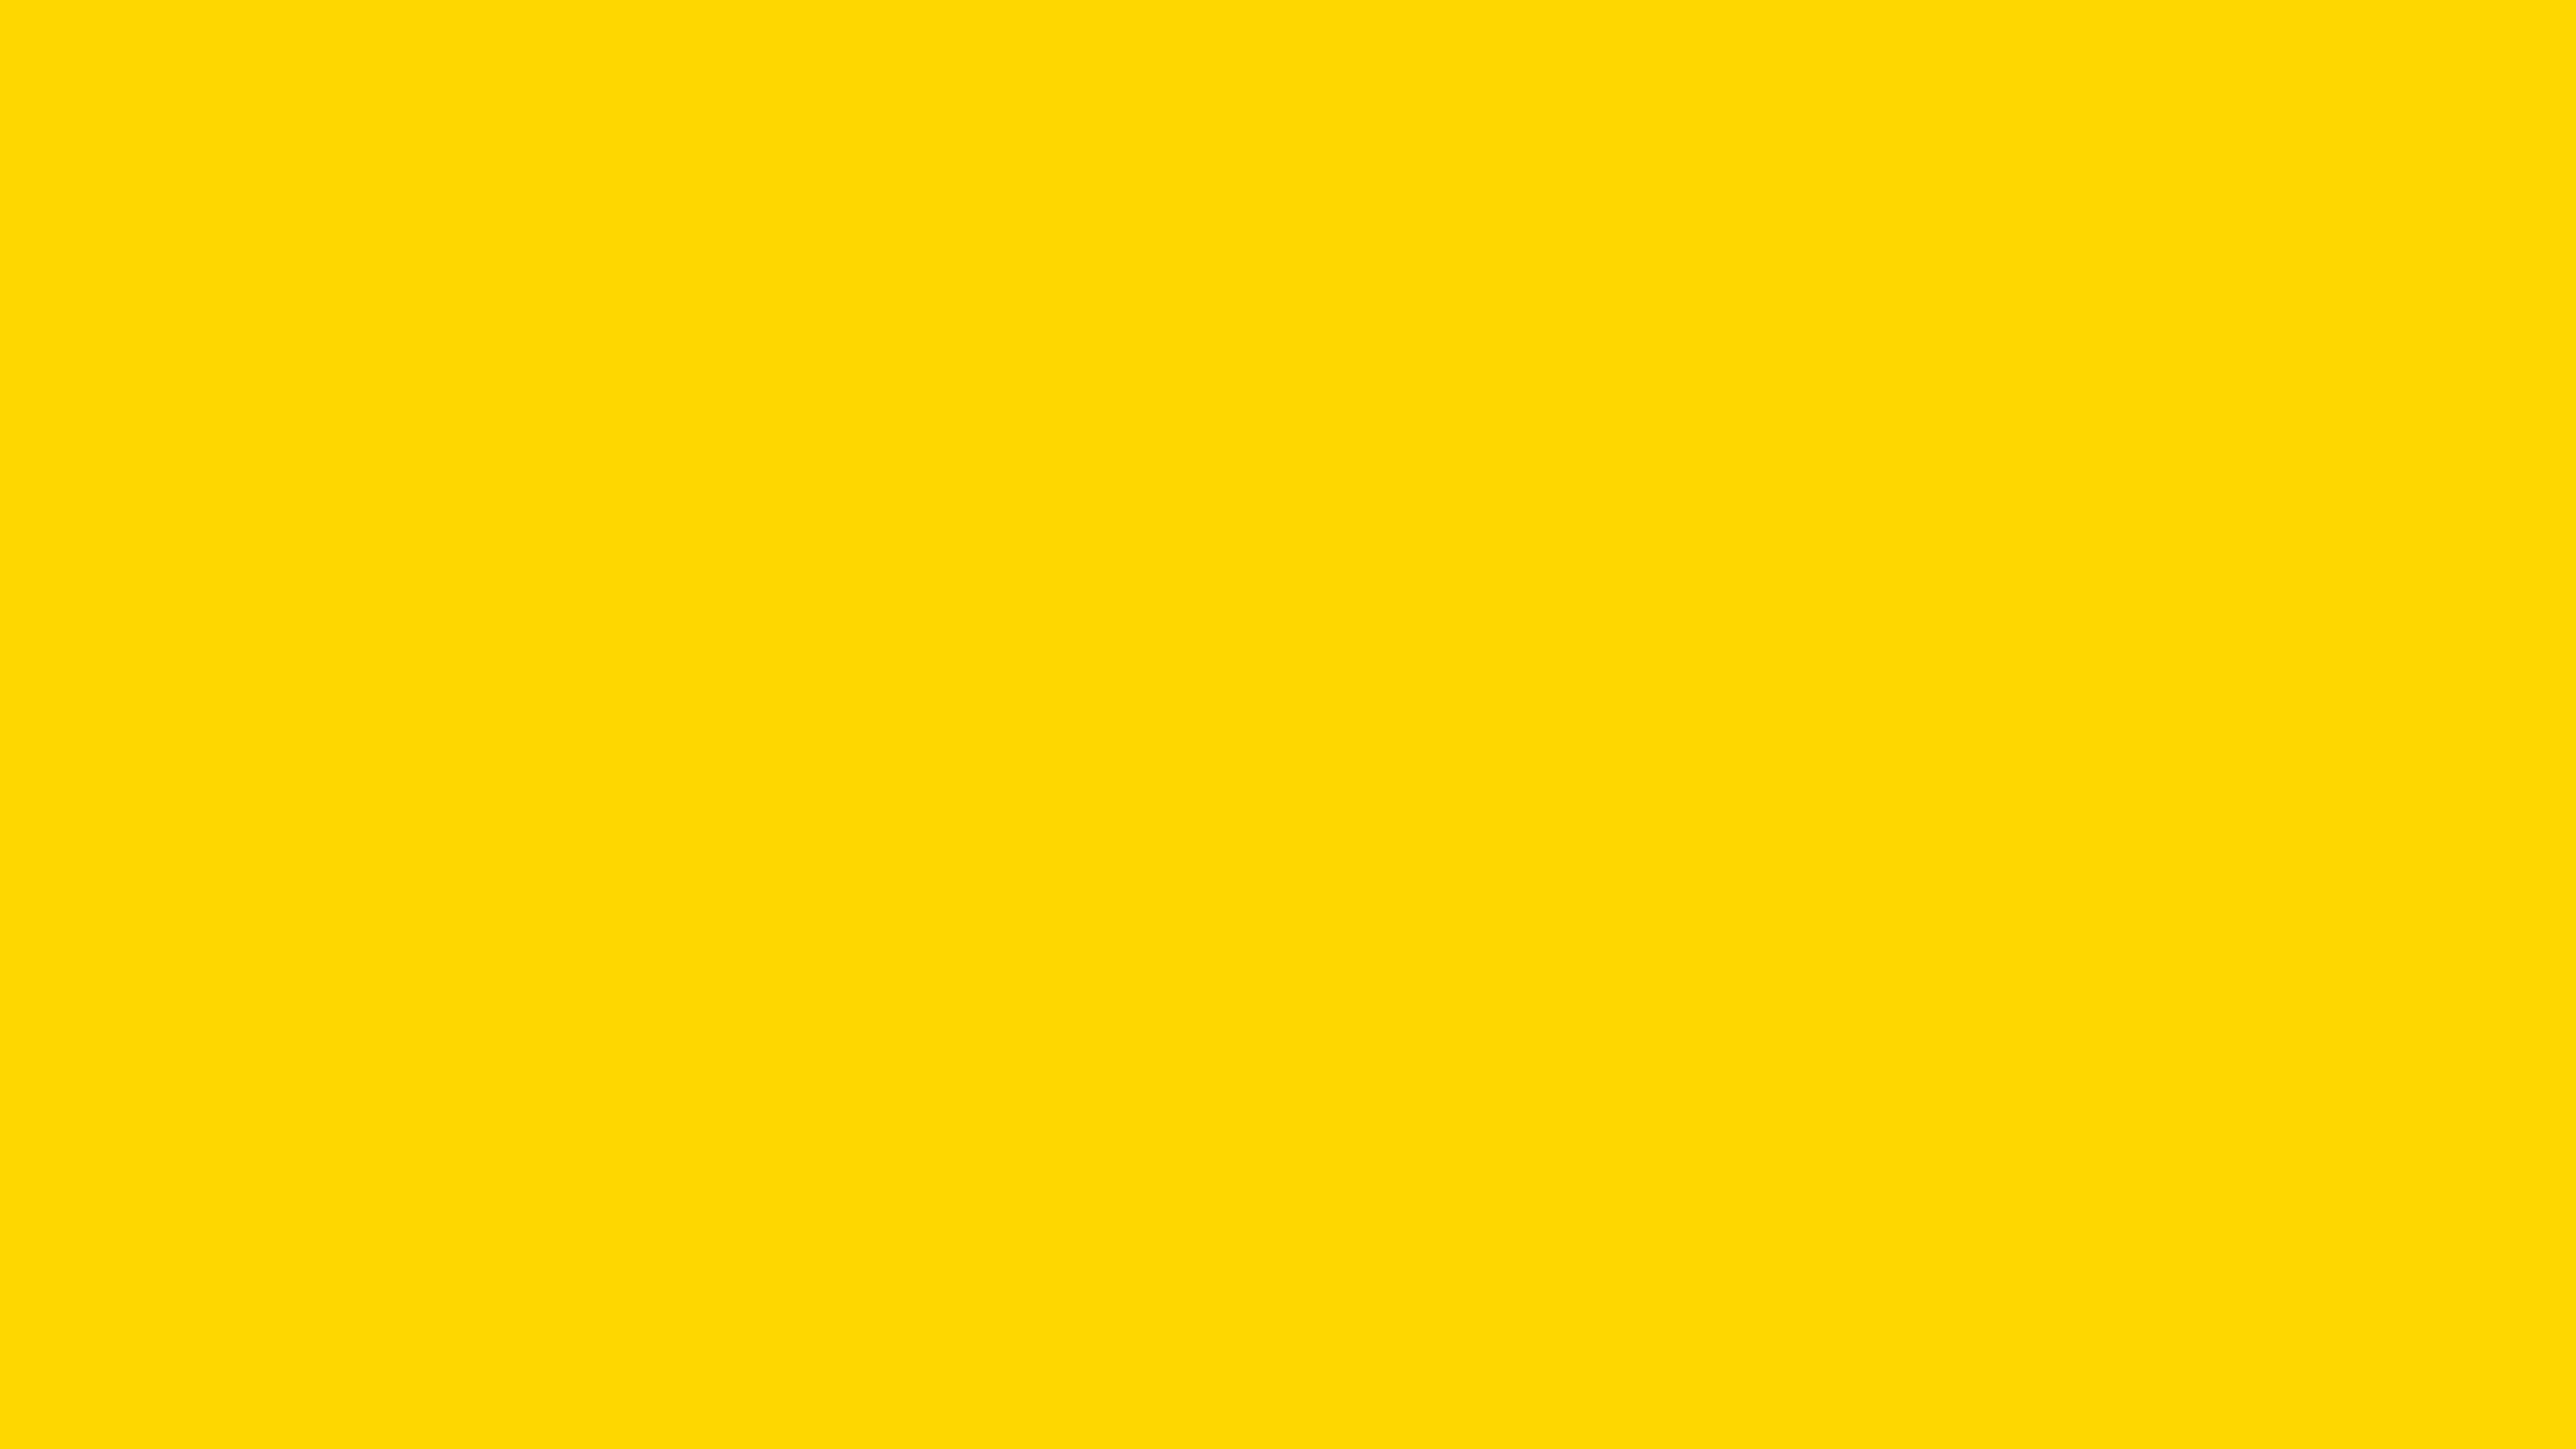 5120x2880 Gold Web Golden Solid Color Background